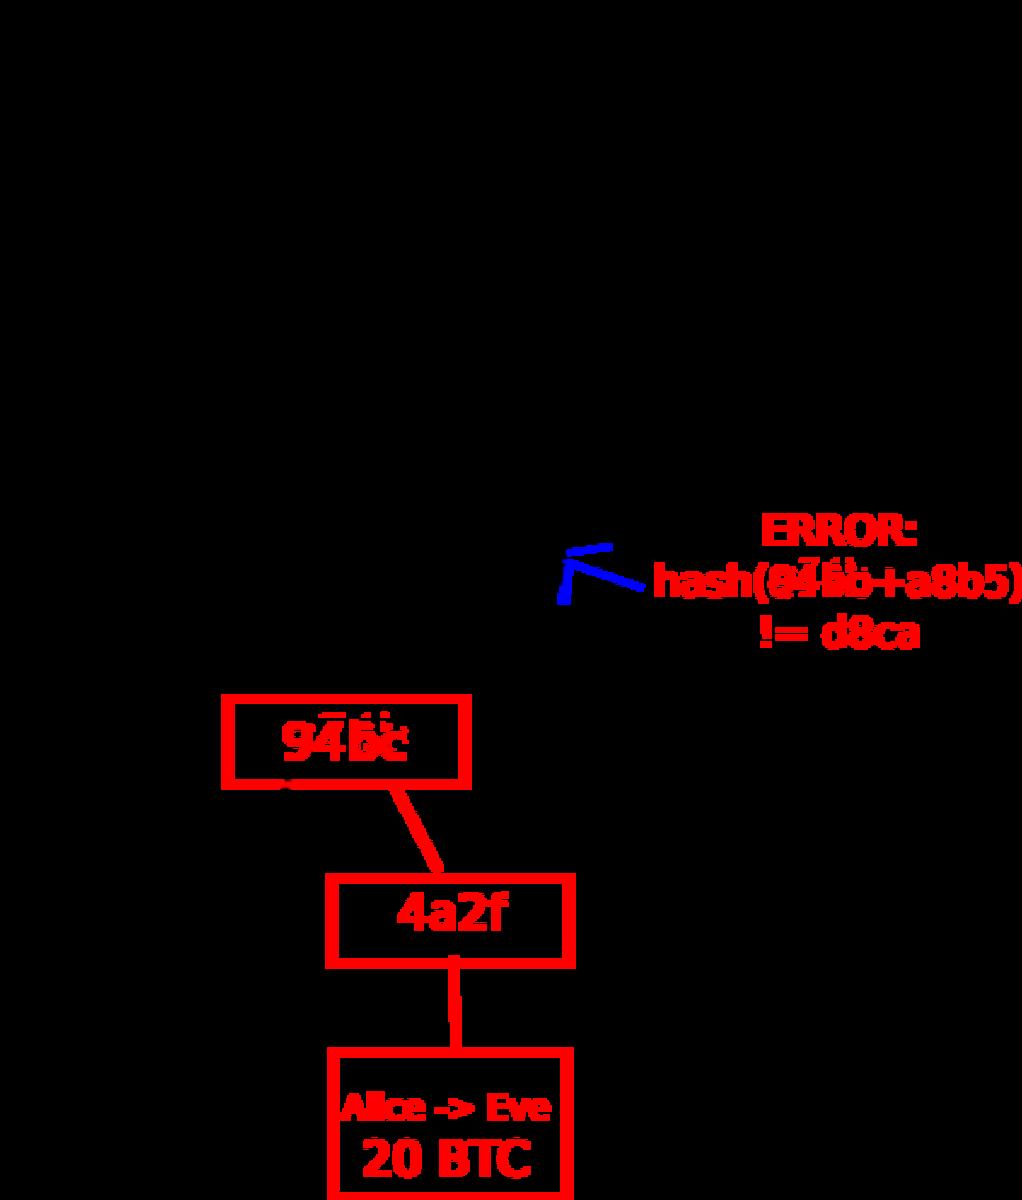 3dcdd0ee-b24b-455c-85cc-a6dbe97aabdc